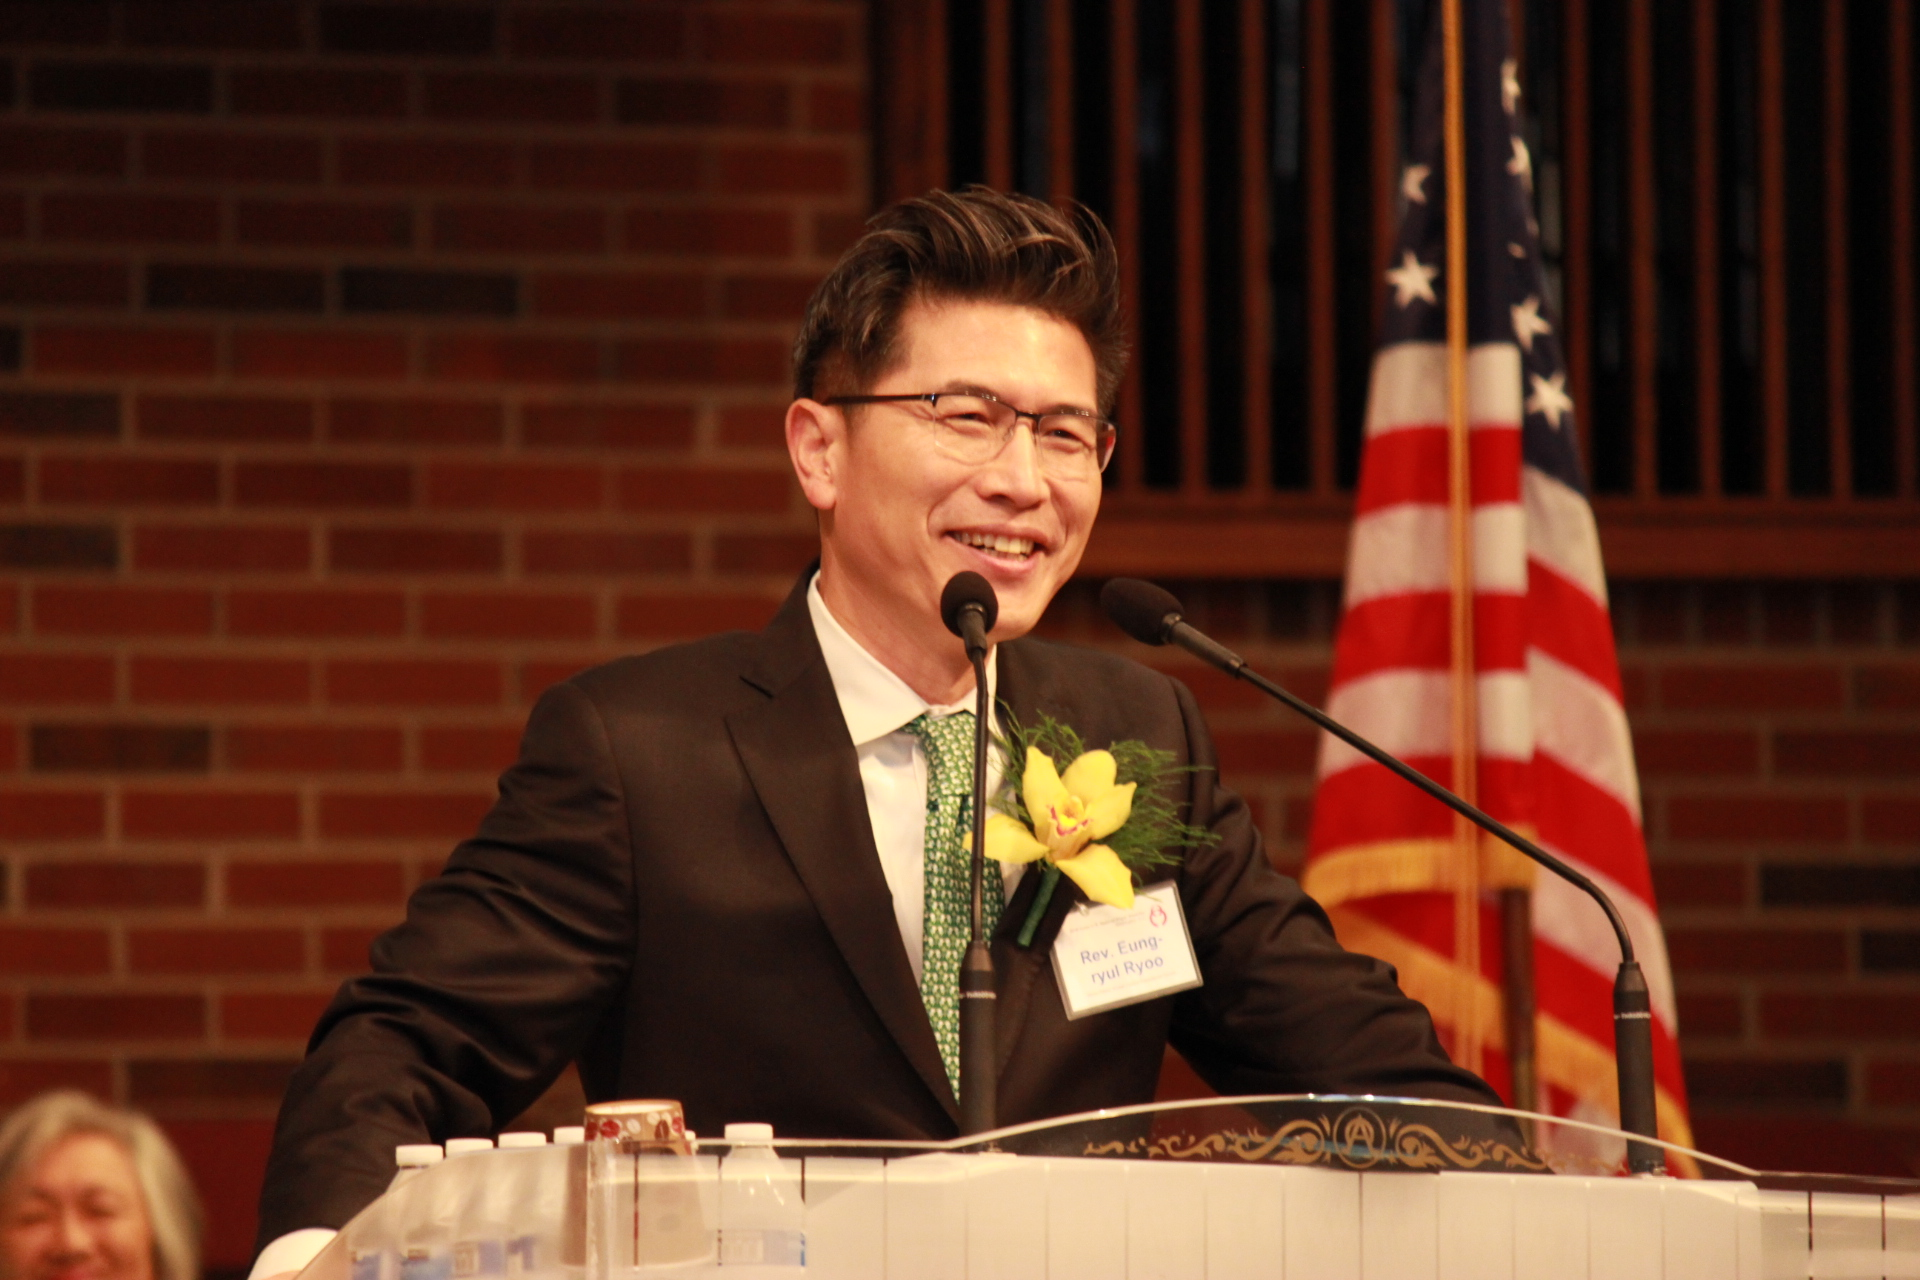 Rev. Eung-yul Ryoo